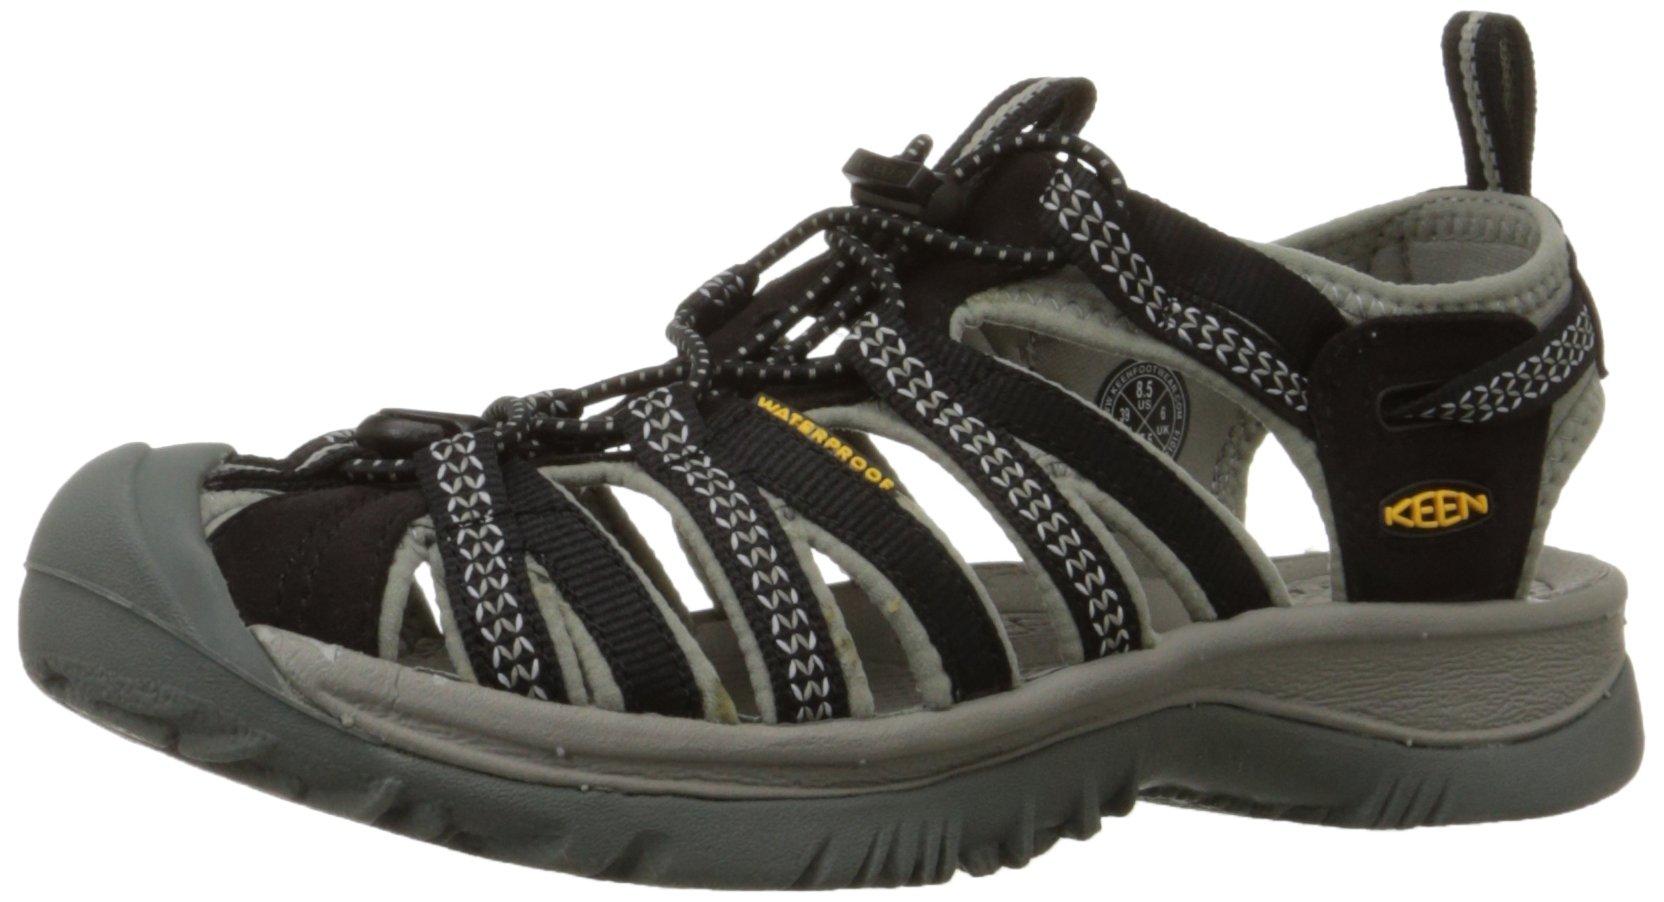 KEEN Women's Whisper Sandal,Black/Neutral Gray,8.5 M US by KEEN